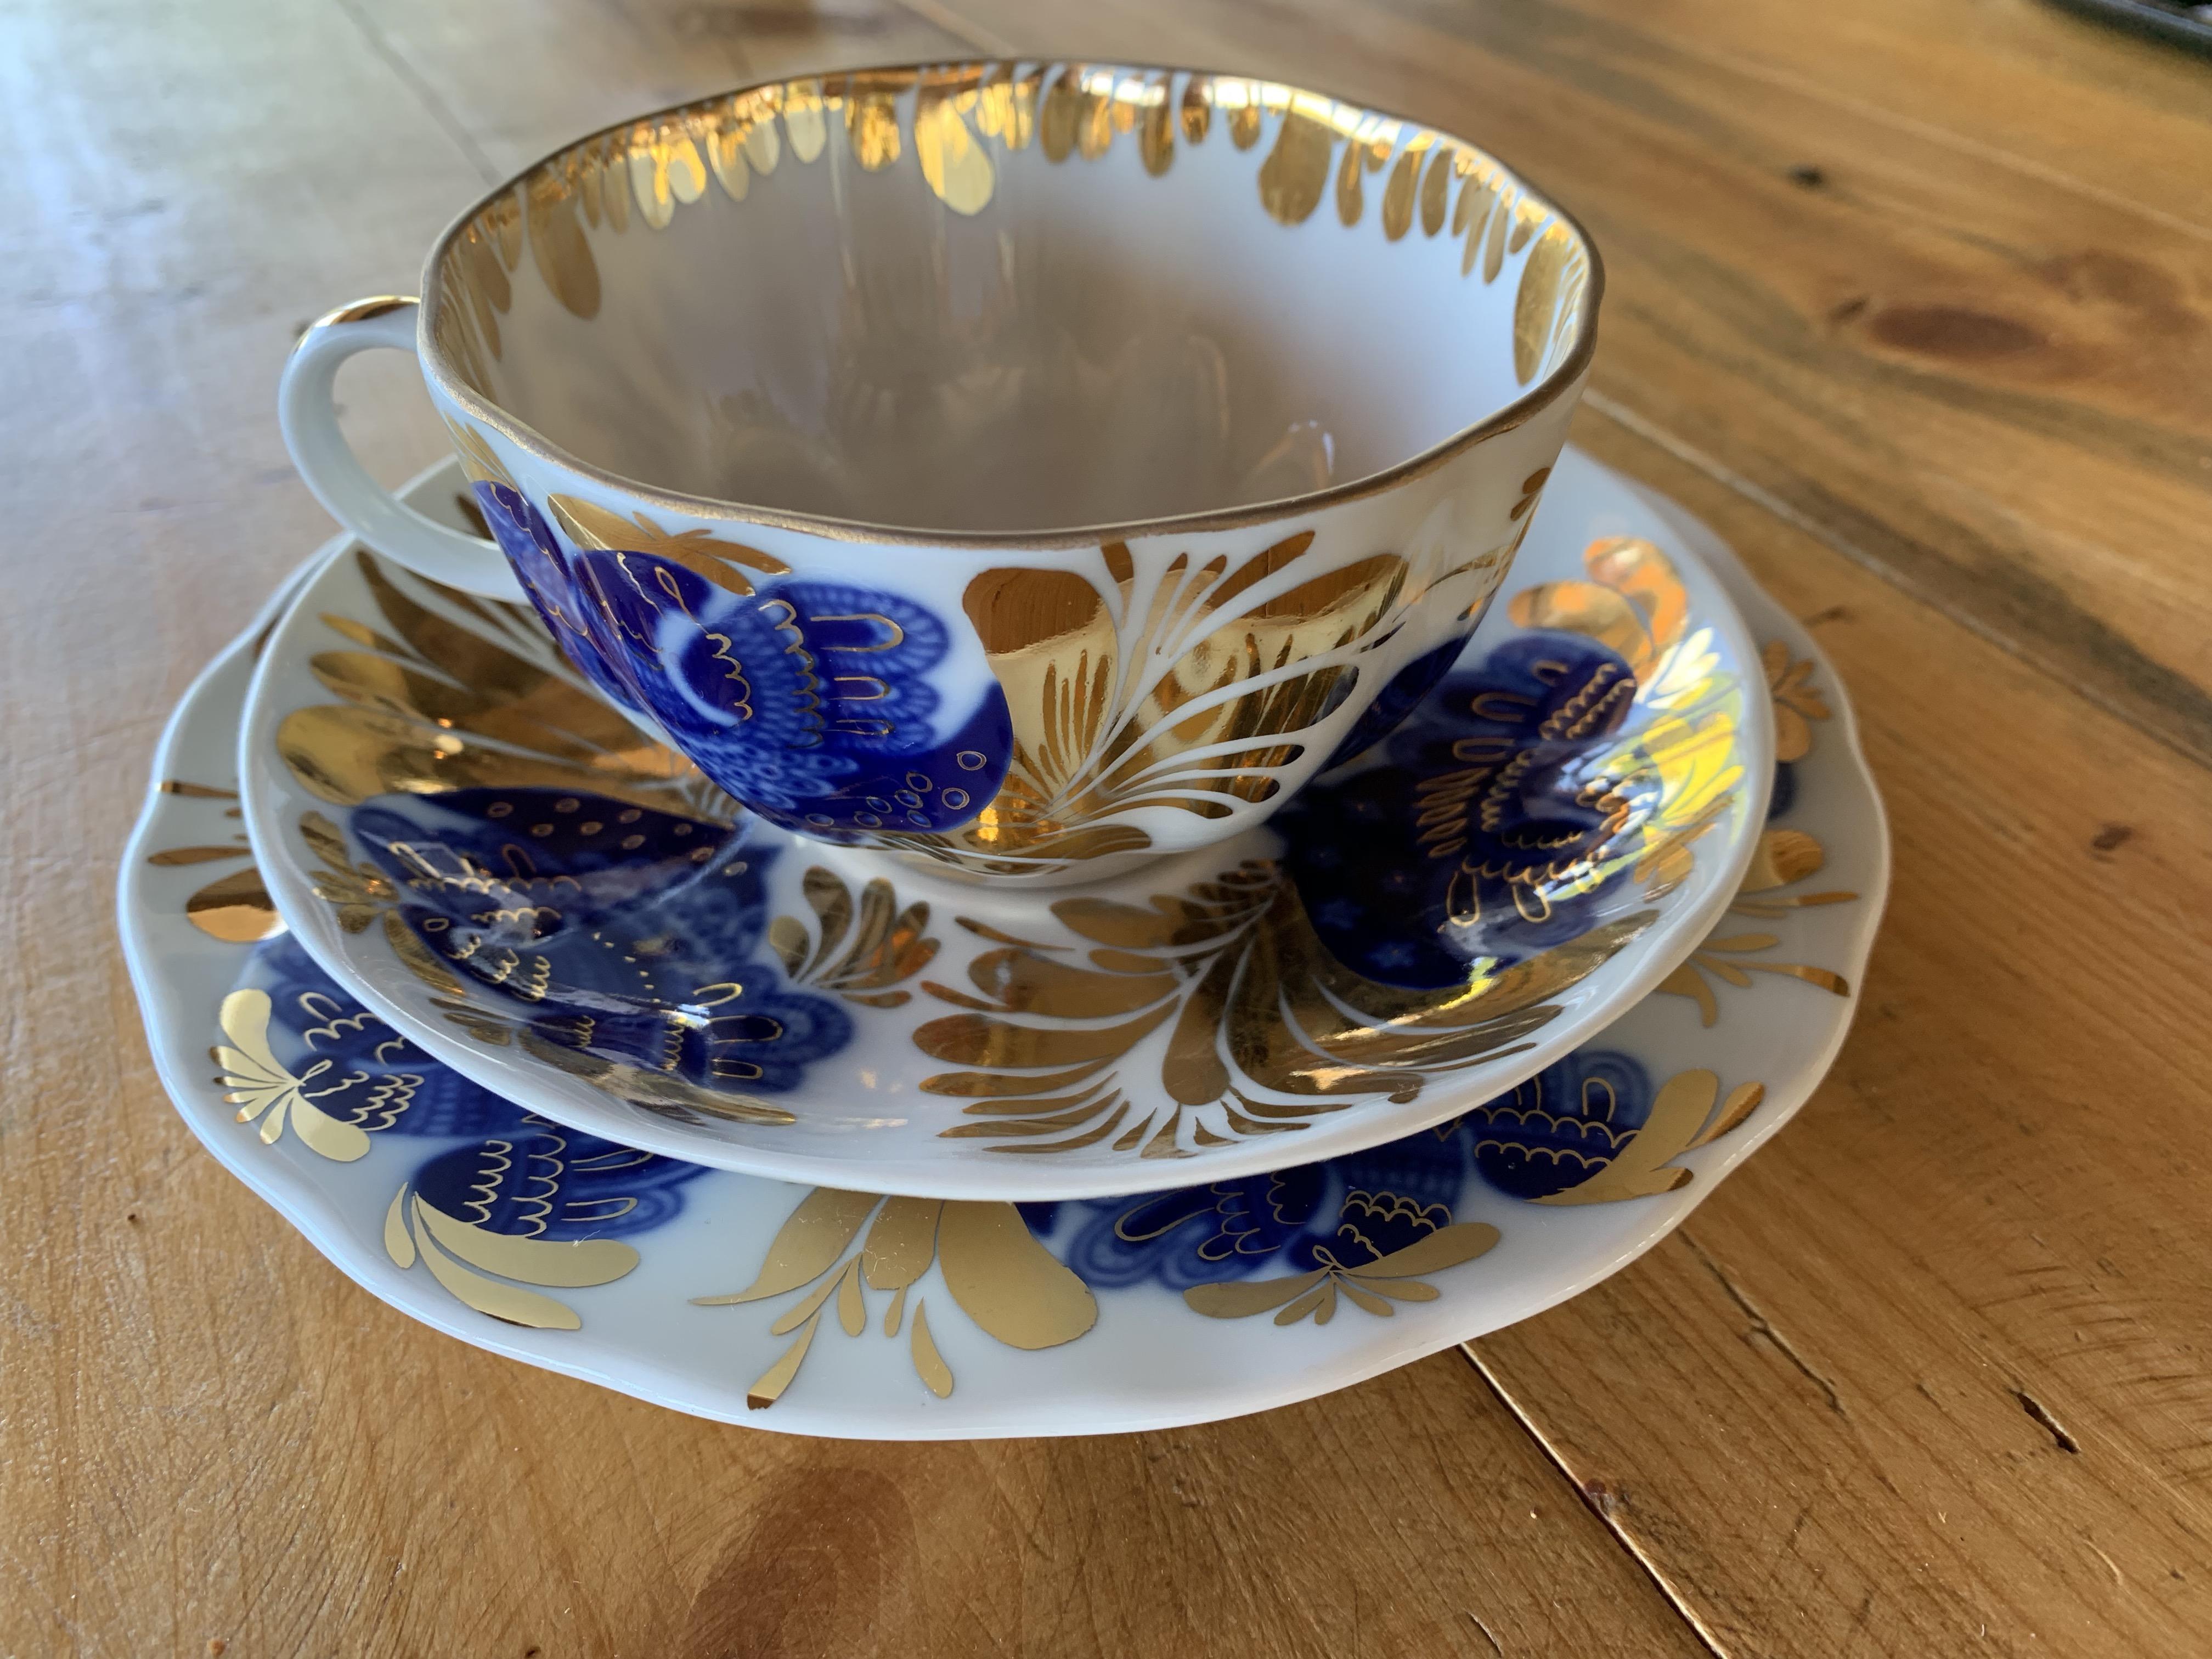 Firebird fine porcelain tea cup with saucer& plate